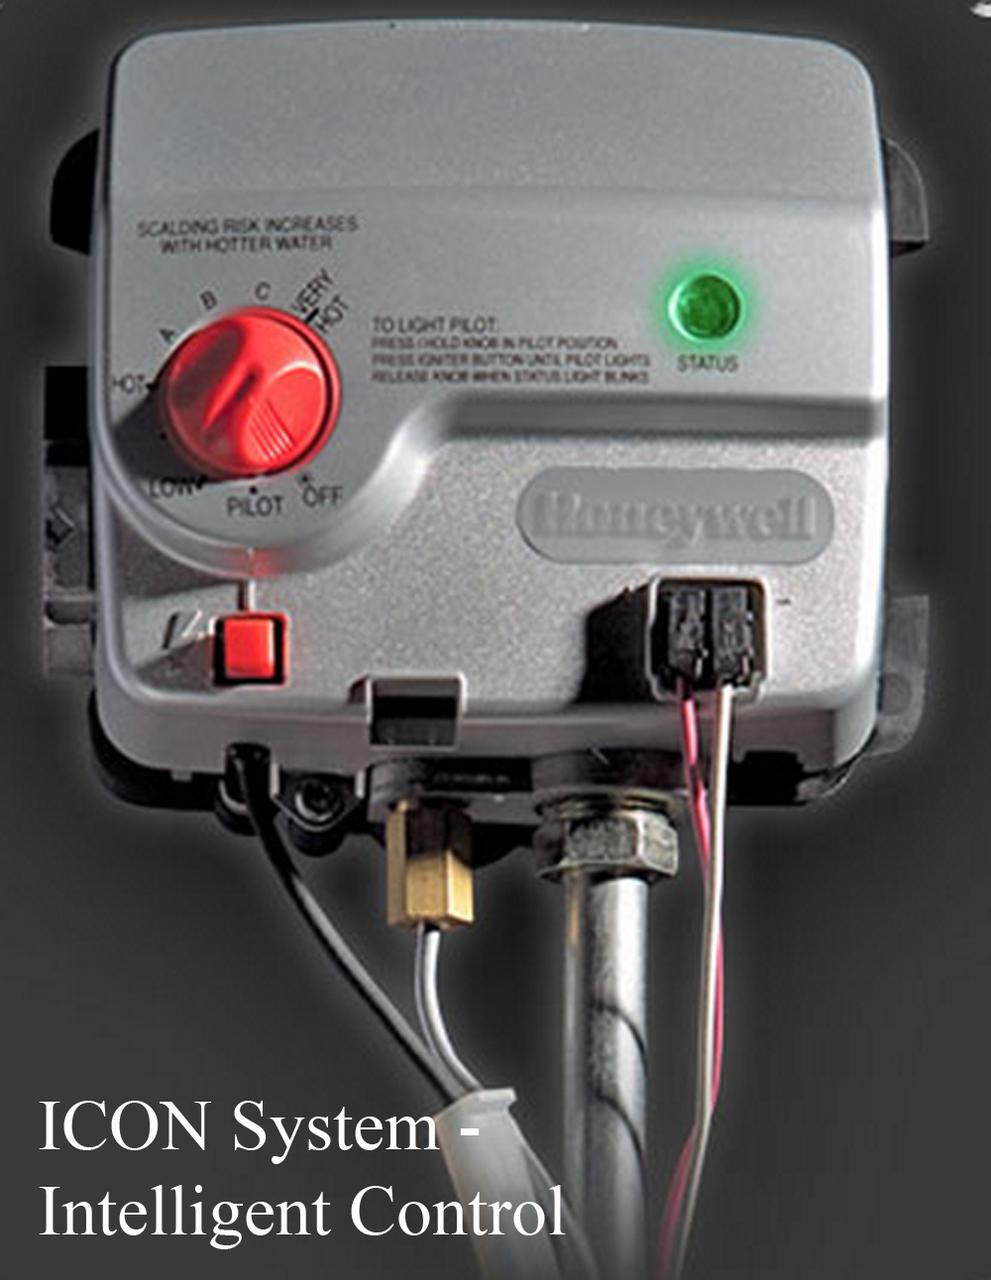 3e6960e1 d7d9 4c97 8270 a5451c7d4a80__49242.1510805884?c=2 bradford white rg2pv40t6n 40 gallon, power vent water heater